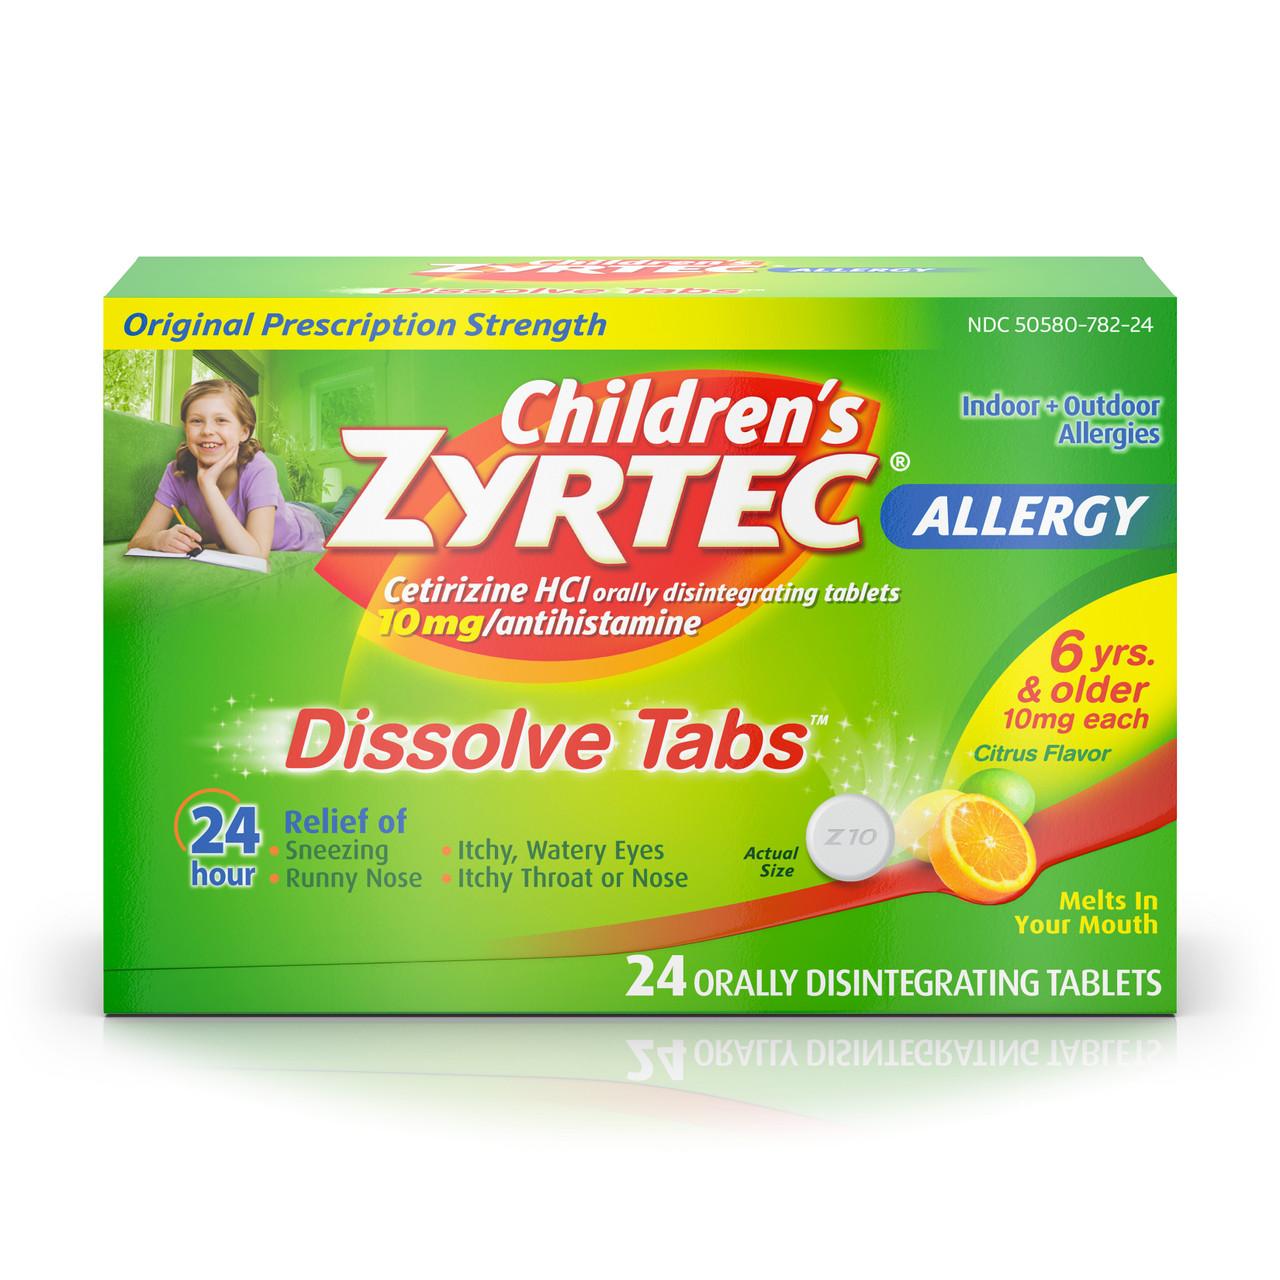 Zyrtec Children's 24-HR Allergy Relief 10 mg Dissolve Tabs, Citrus, 24 ct